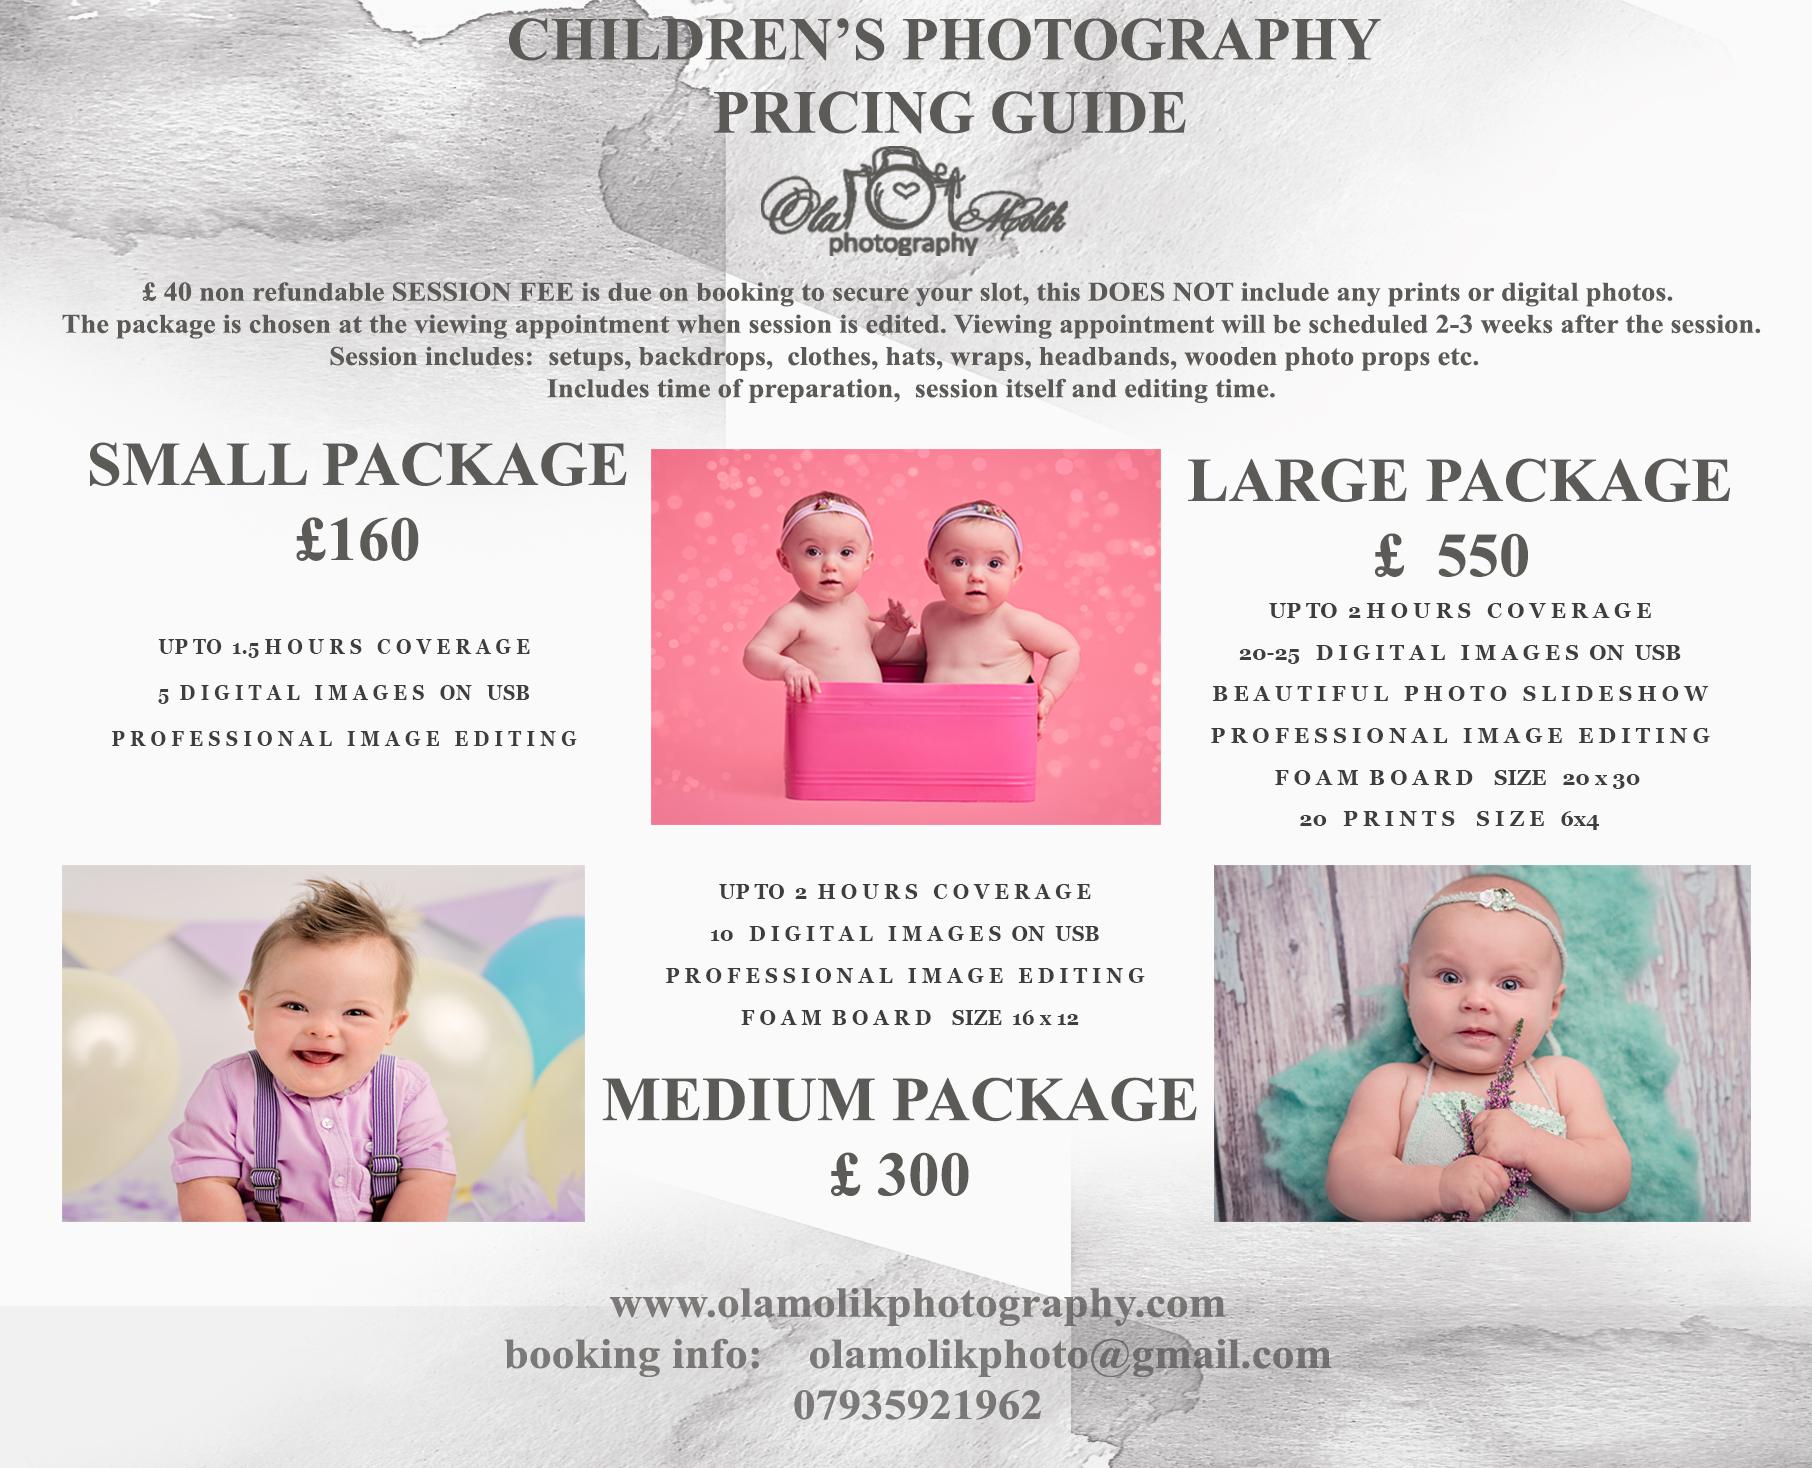 children's photography Ola Molik Photographer